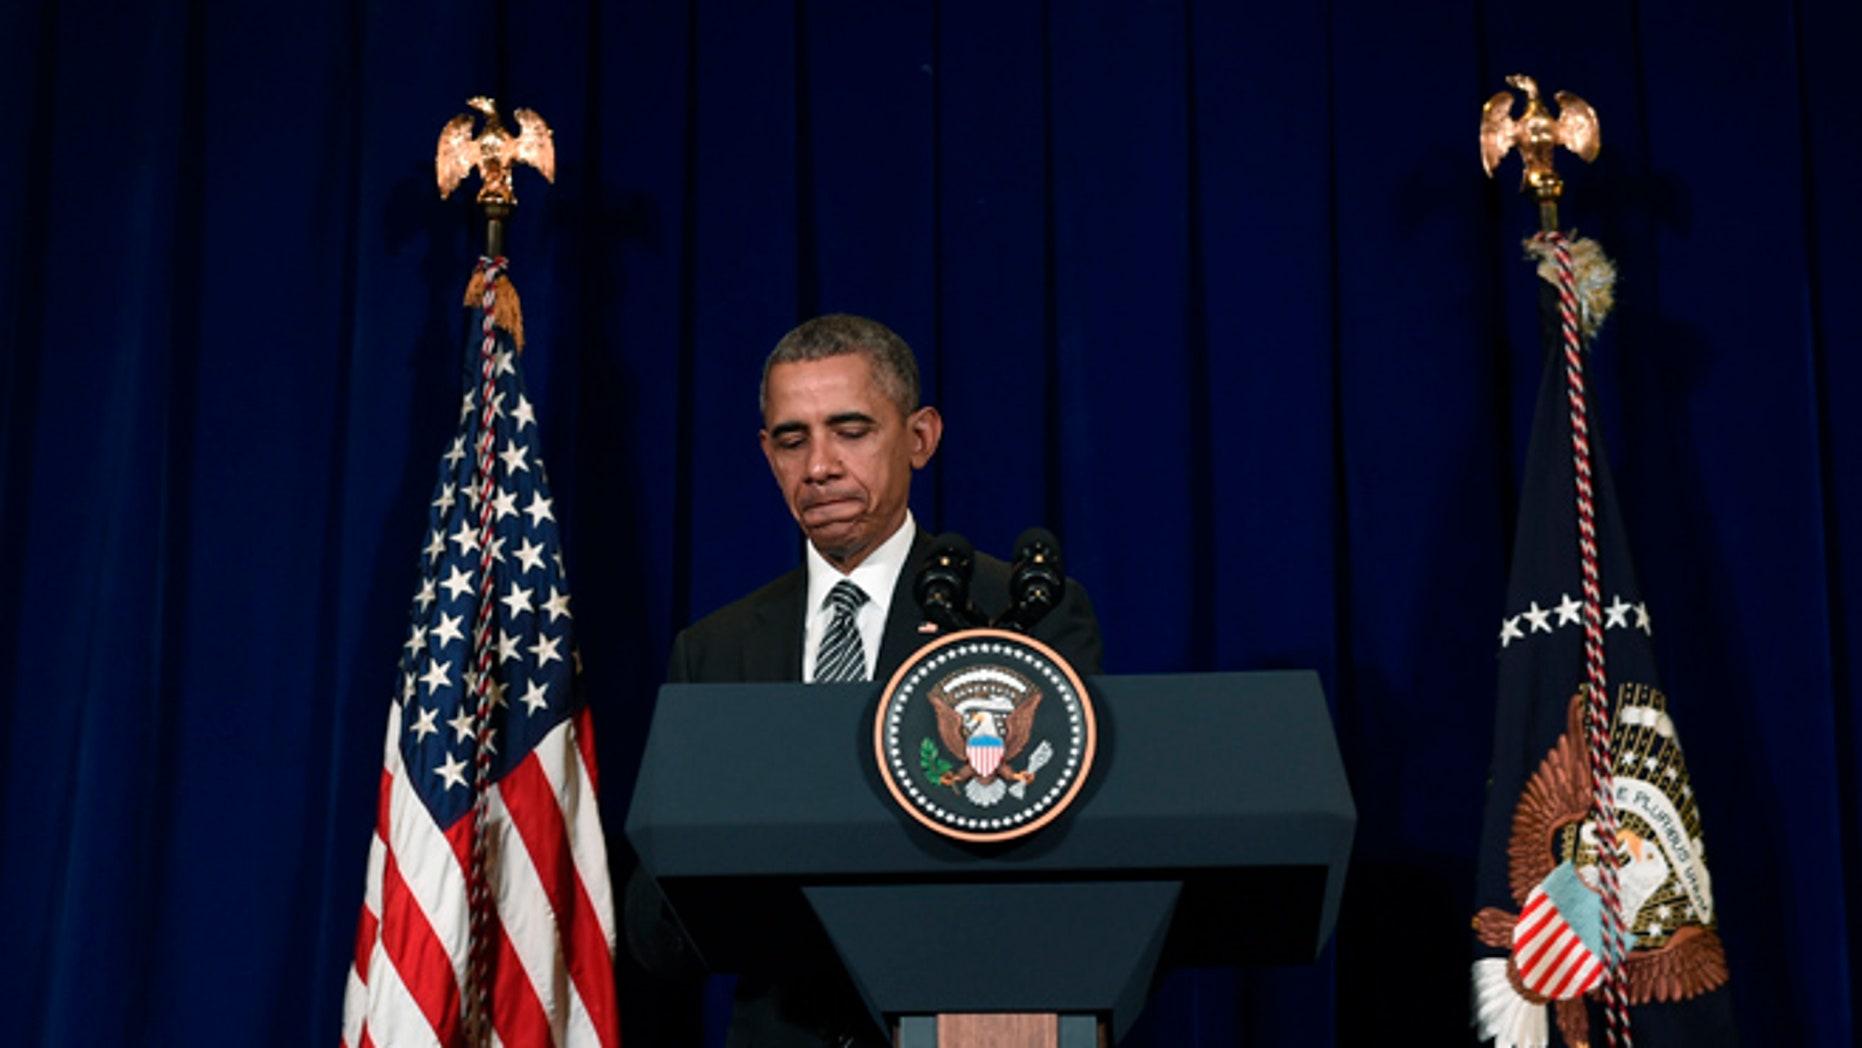 Sunday, Nov. 22, 2015: President Obama at a news conference in Kuala Lumpur, Malaysia.